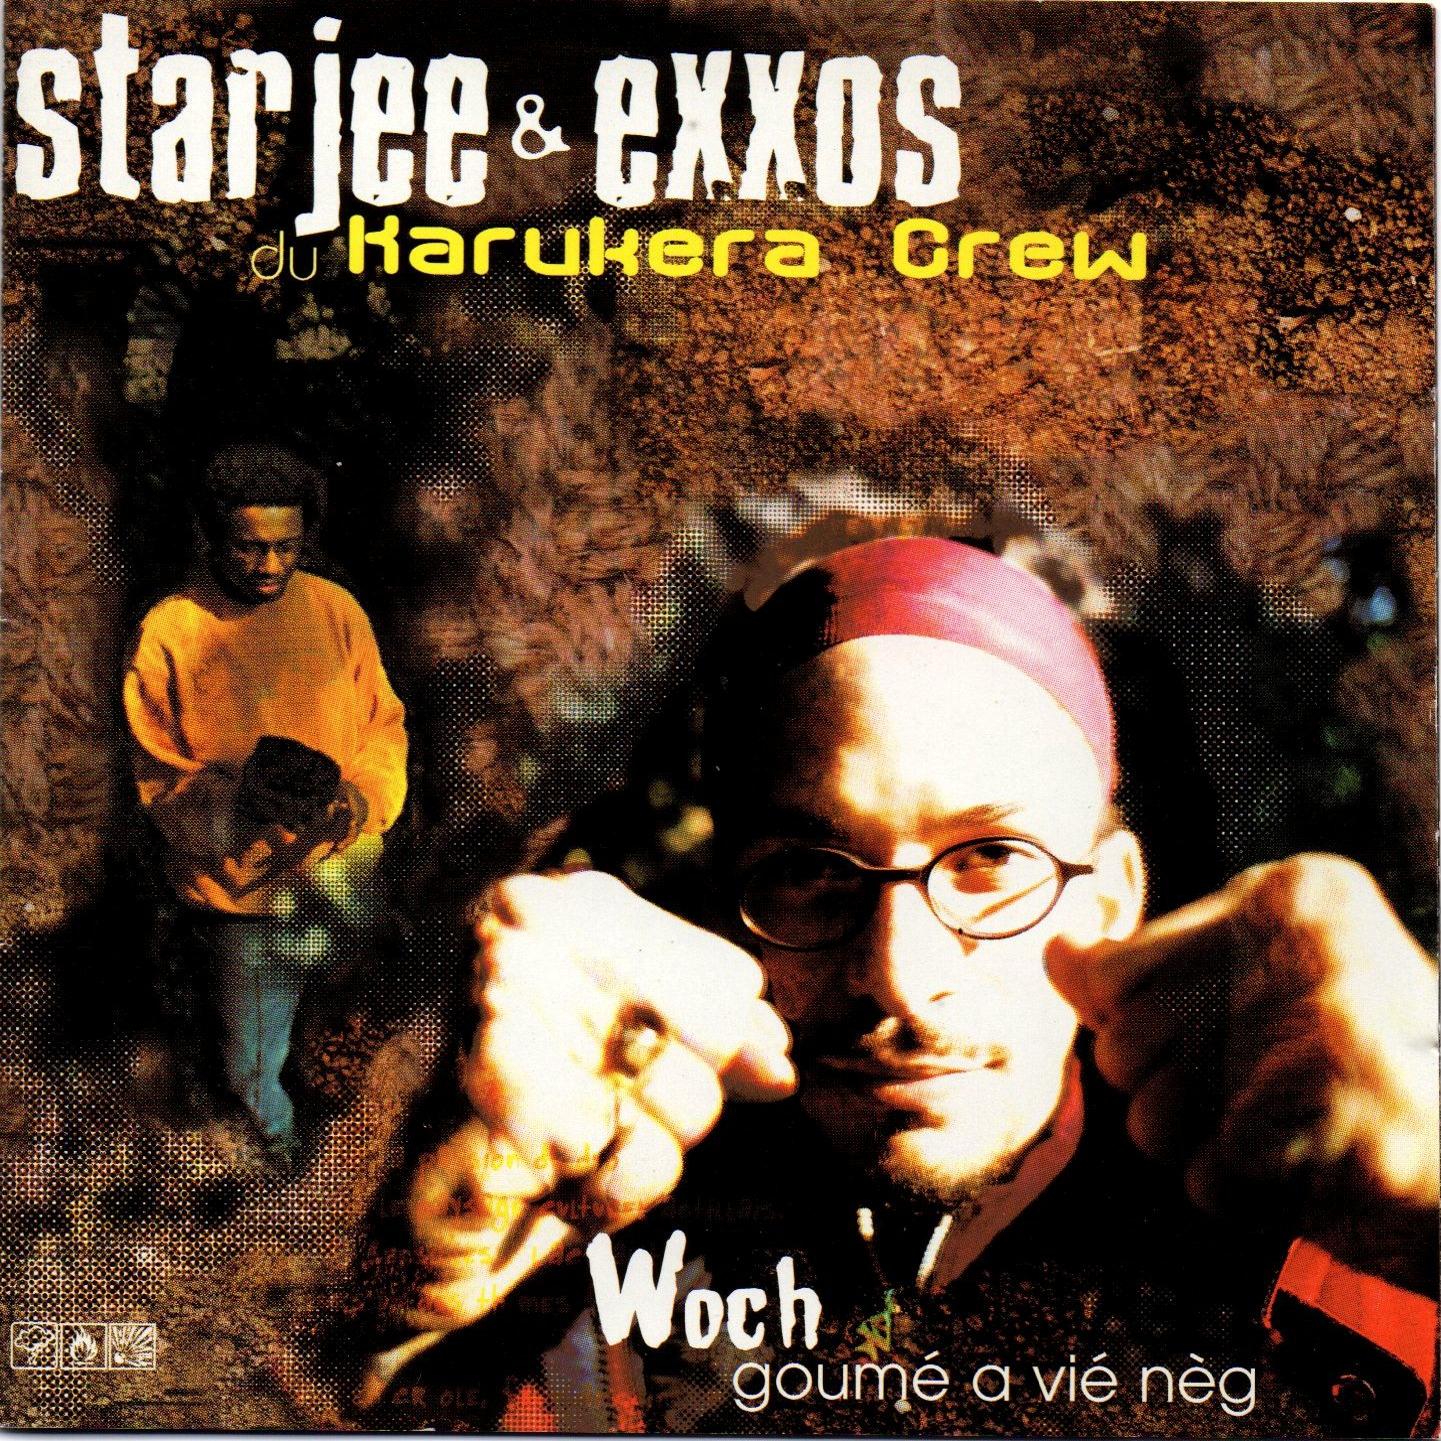 Star Jee and Exxos - Woch Goumé A Vié Nèg